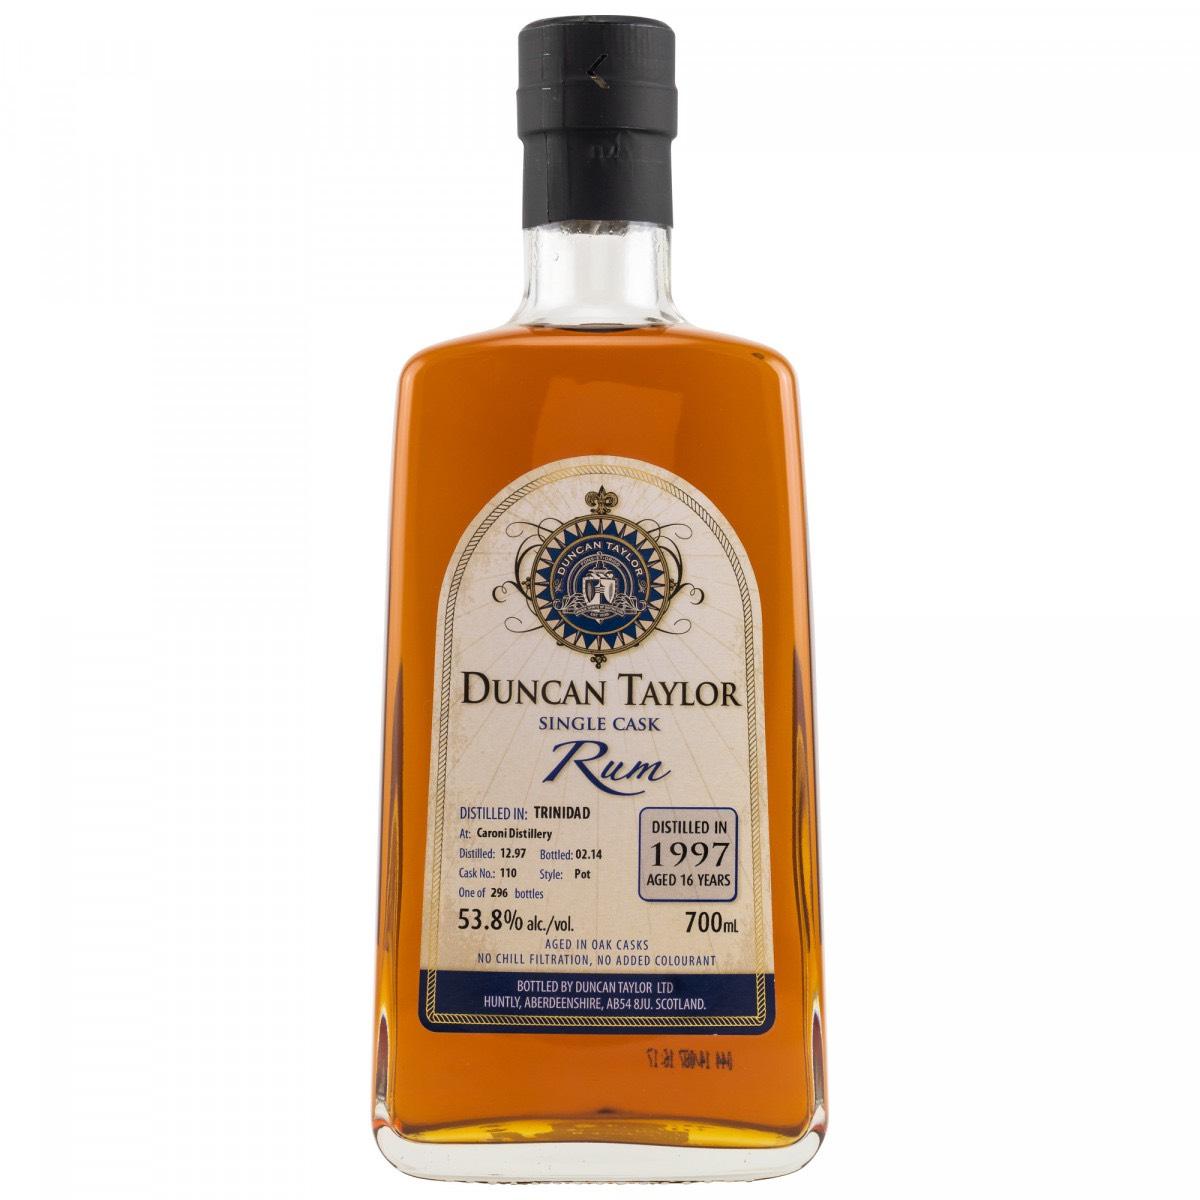 Bottle image of Single Cask Rum HTR